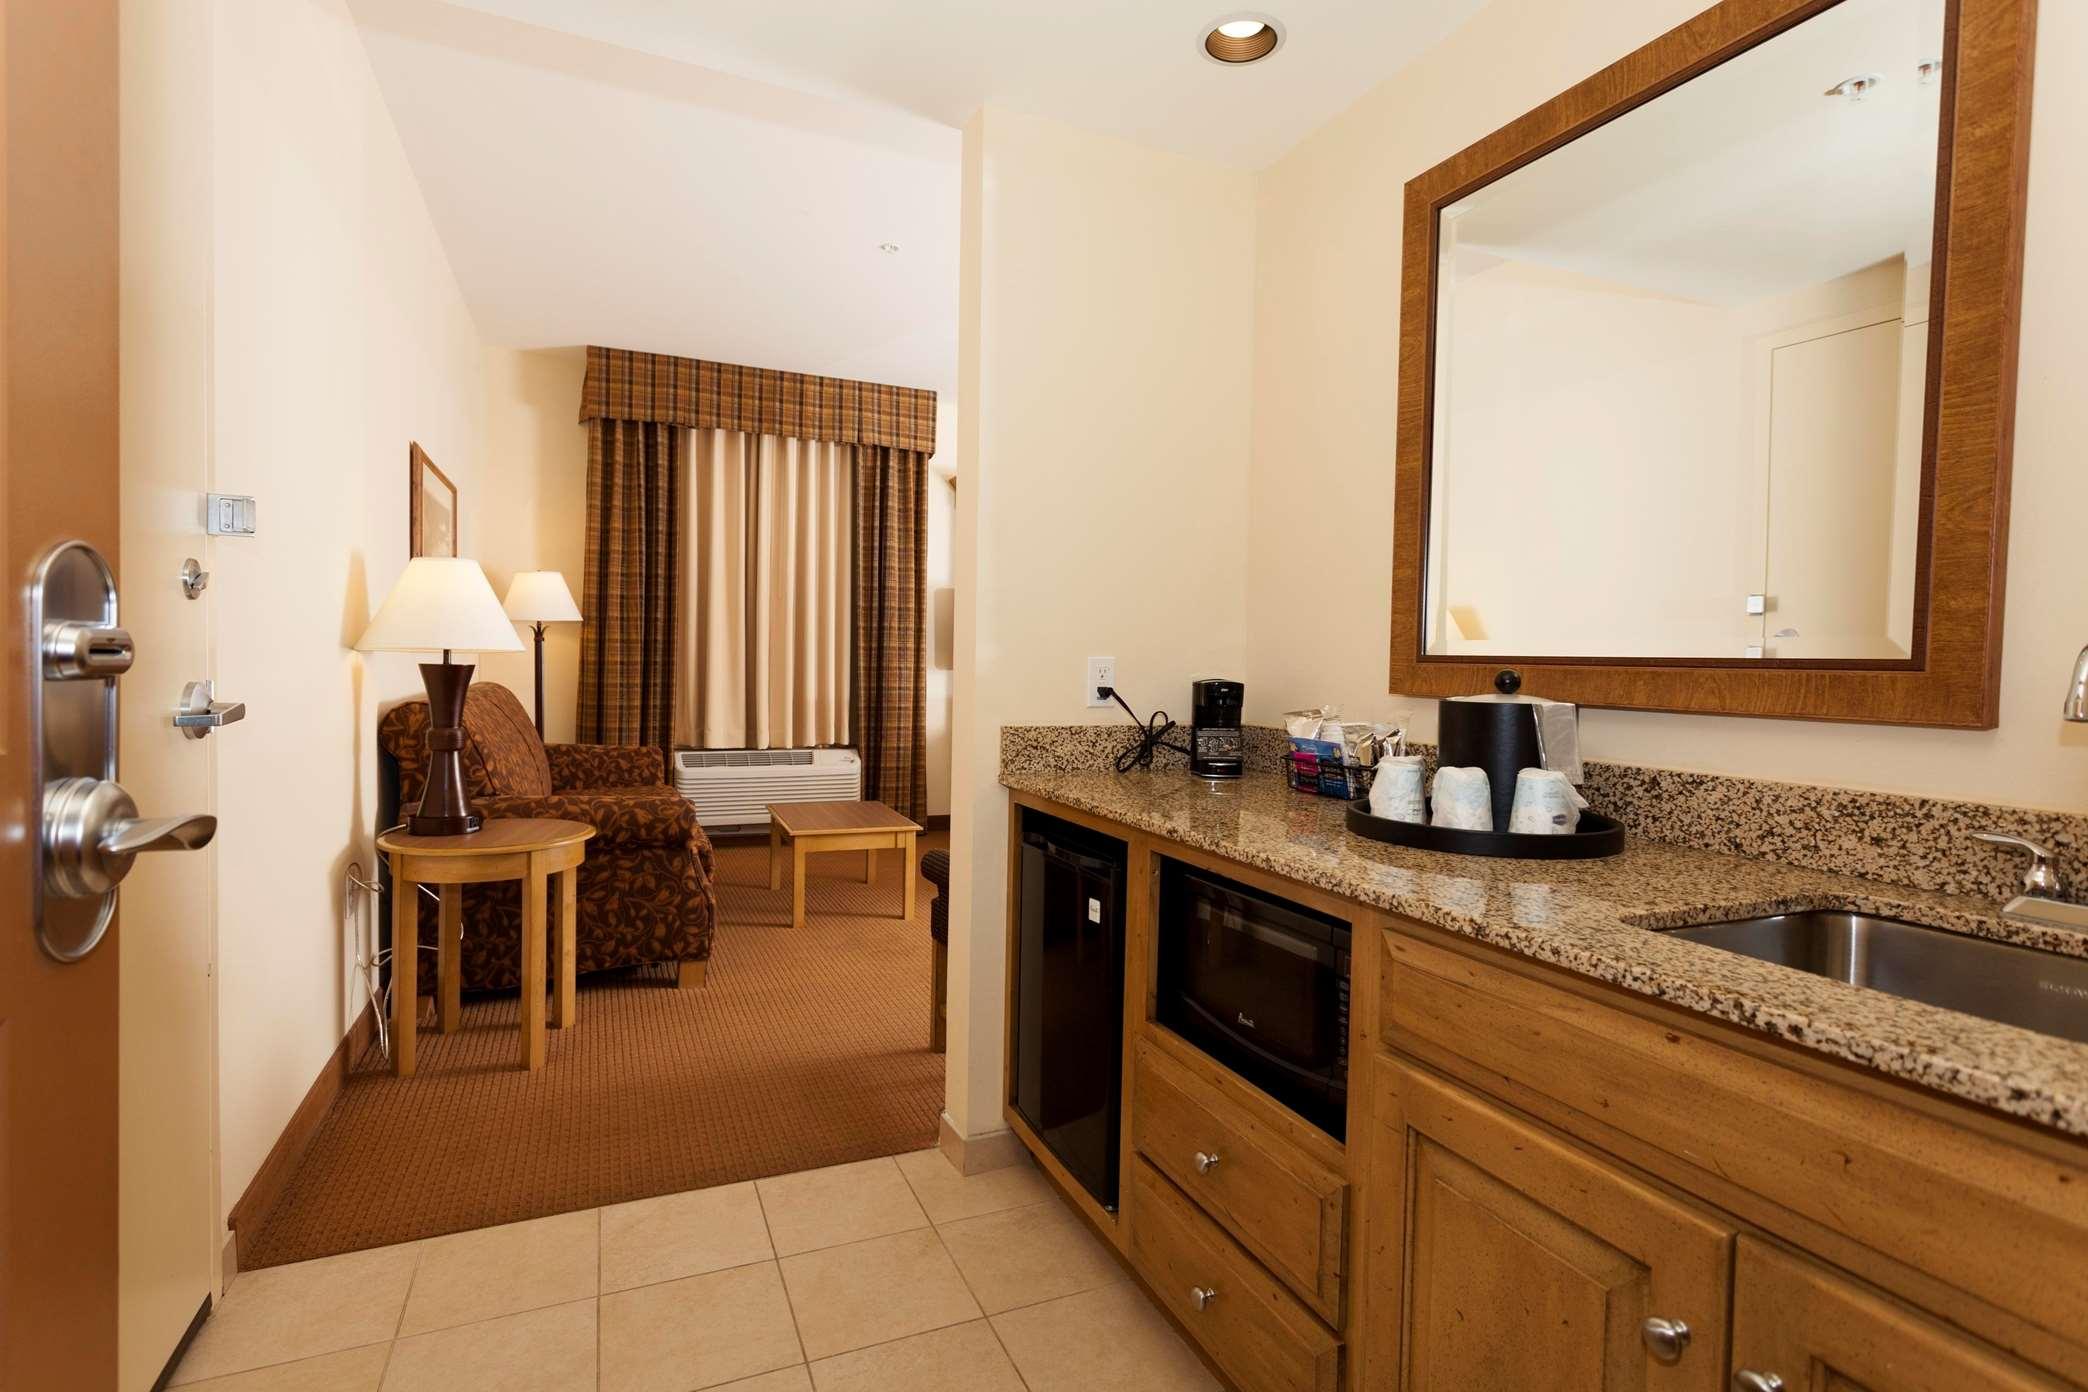 Hampton Inn & Suites Riverton image 0